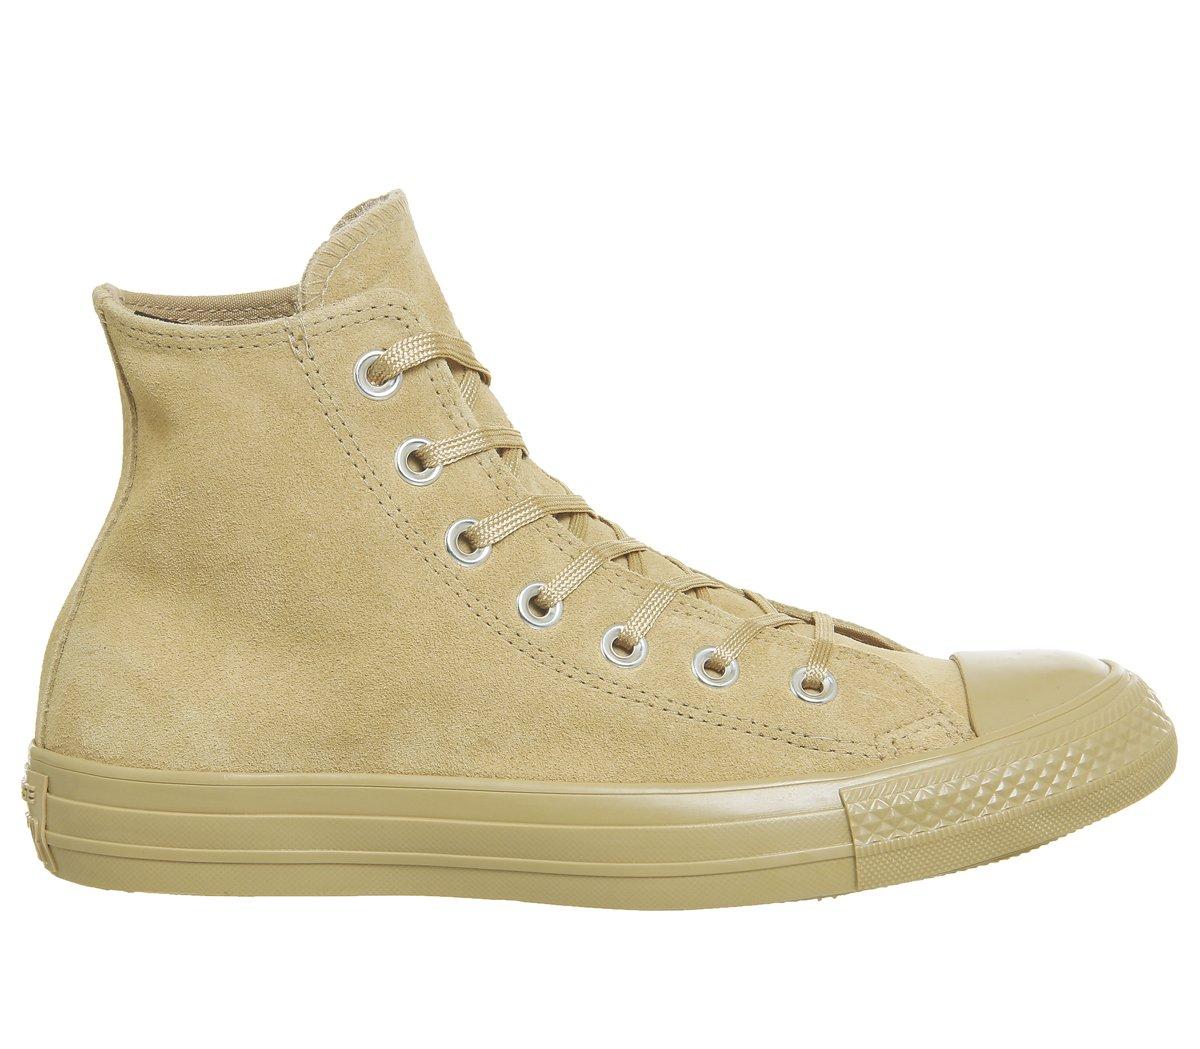 Converse AS Hi Can charcoal 1J793 Unisex-Erwachsene Sneaker  36.5 EU Braun Beige